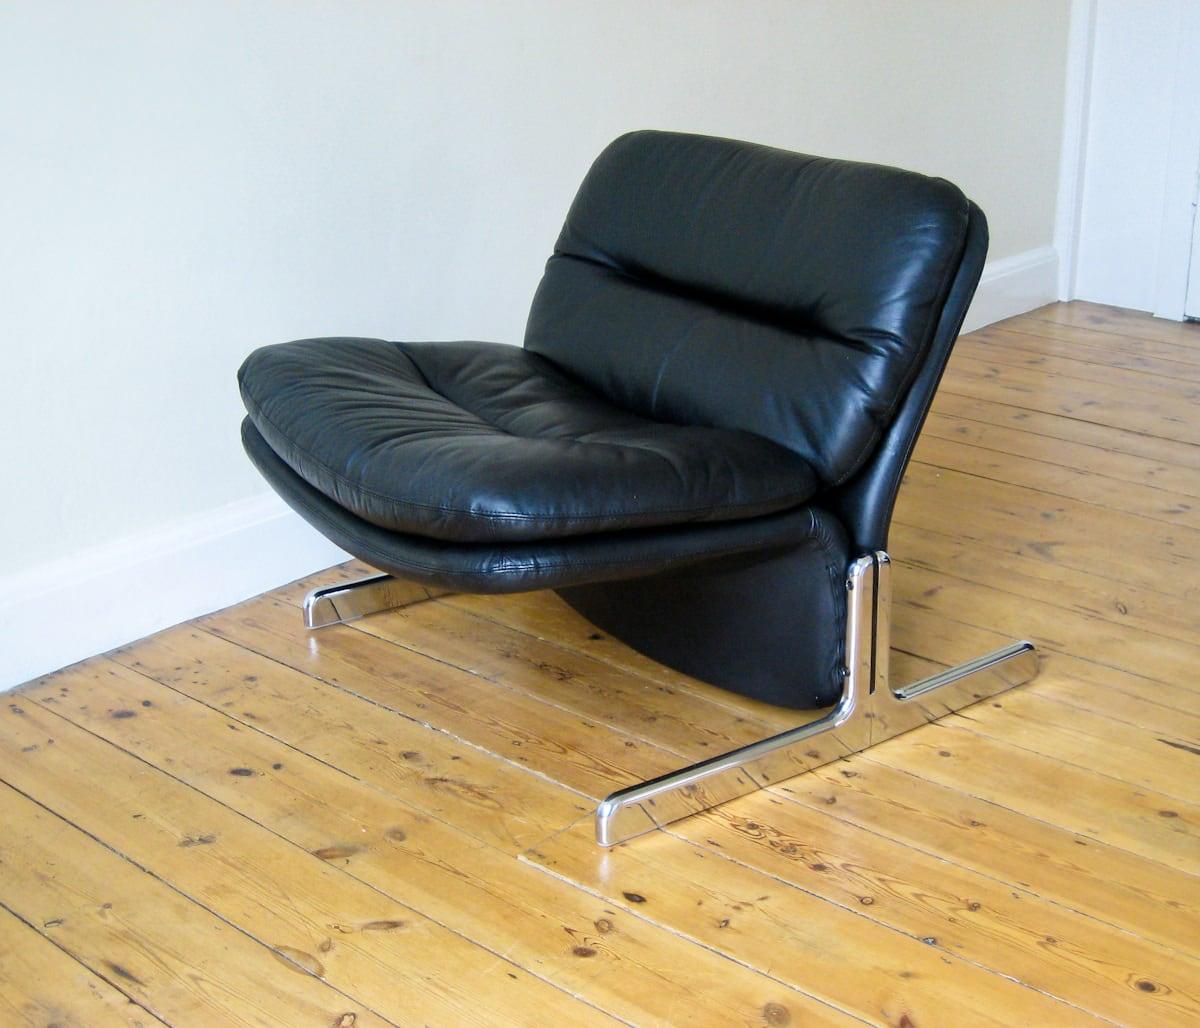 1970's leather chairs vintage furniture London Brunati Italian